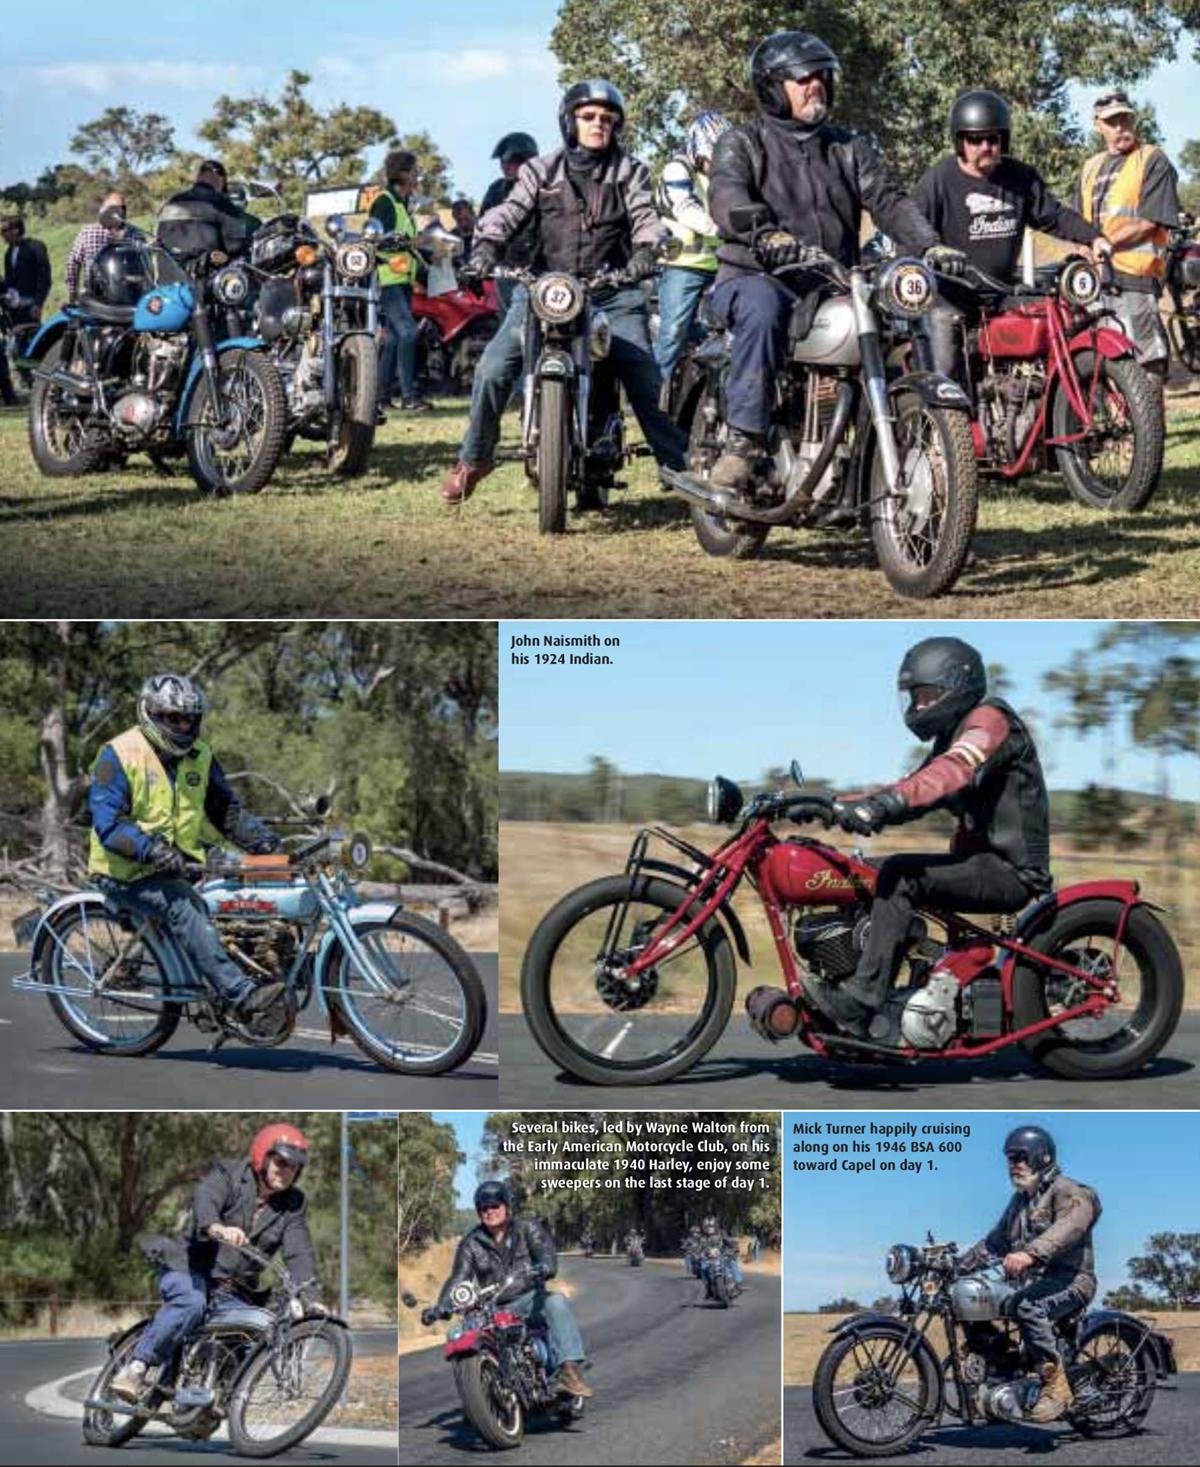 Full House at Bunbury - Old Bike Australasia